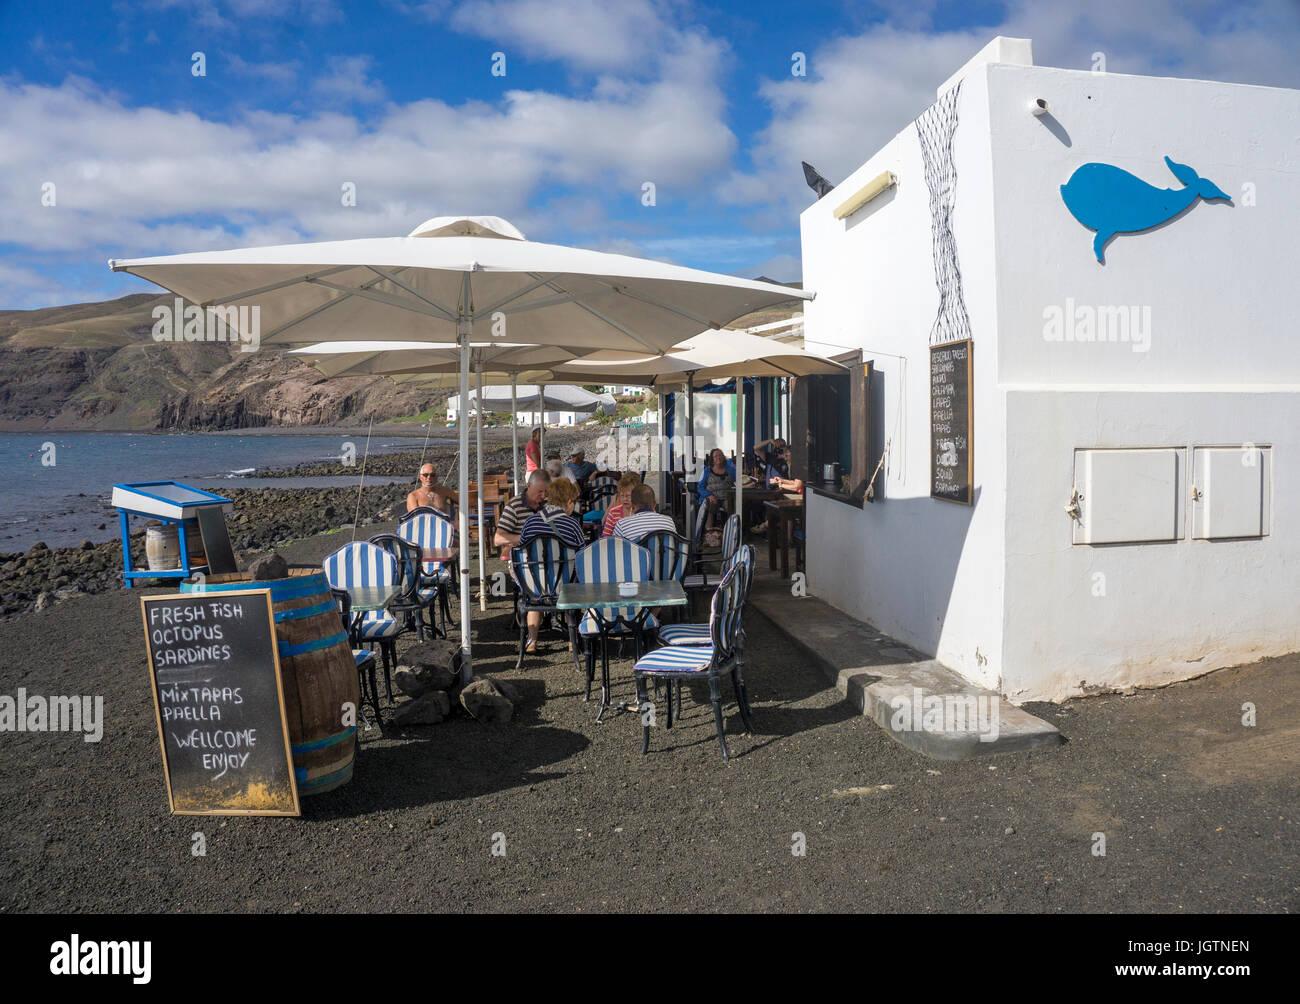 Fish restaurant at the beach of the fishing village Playa Quemada, Lanzarote island, Canary islands, Spain, Europe Stock Photo